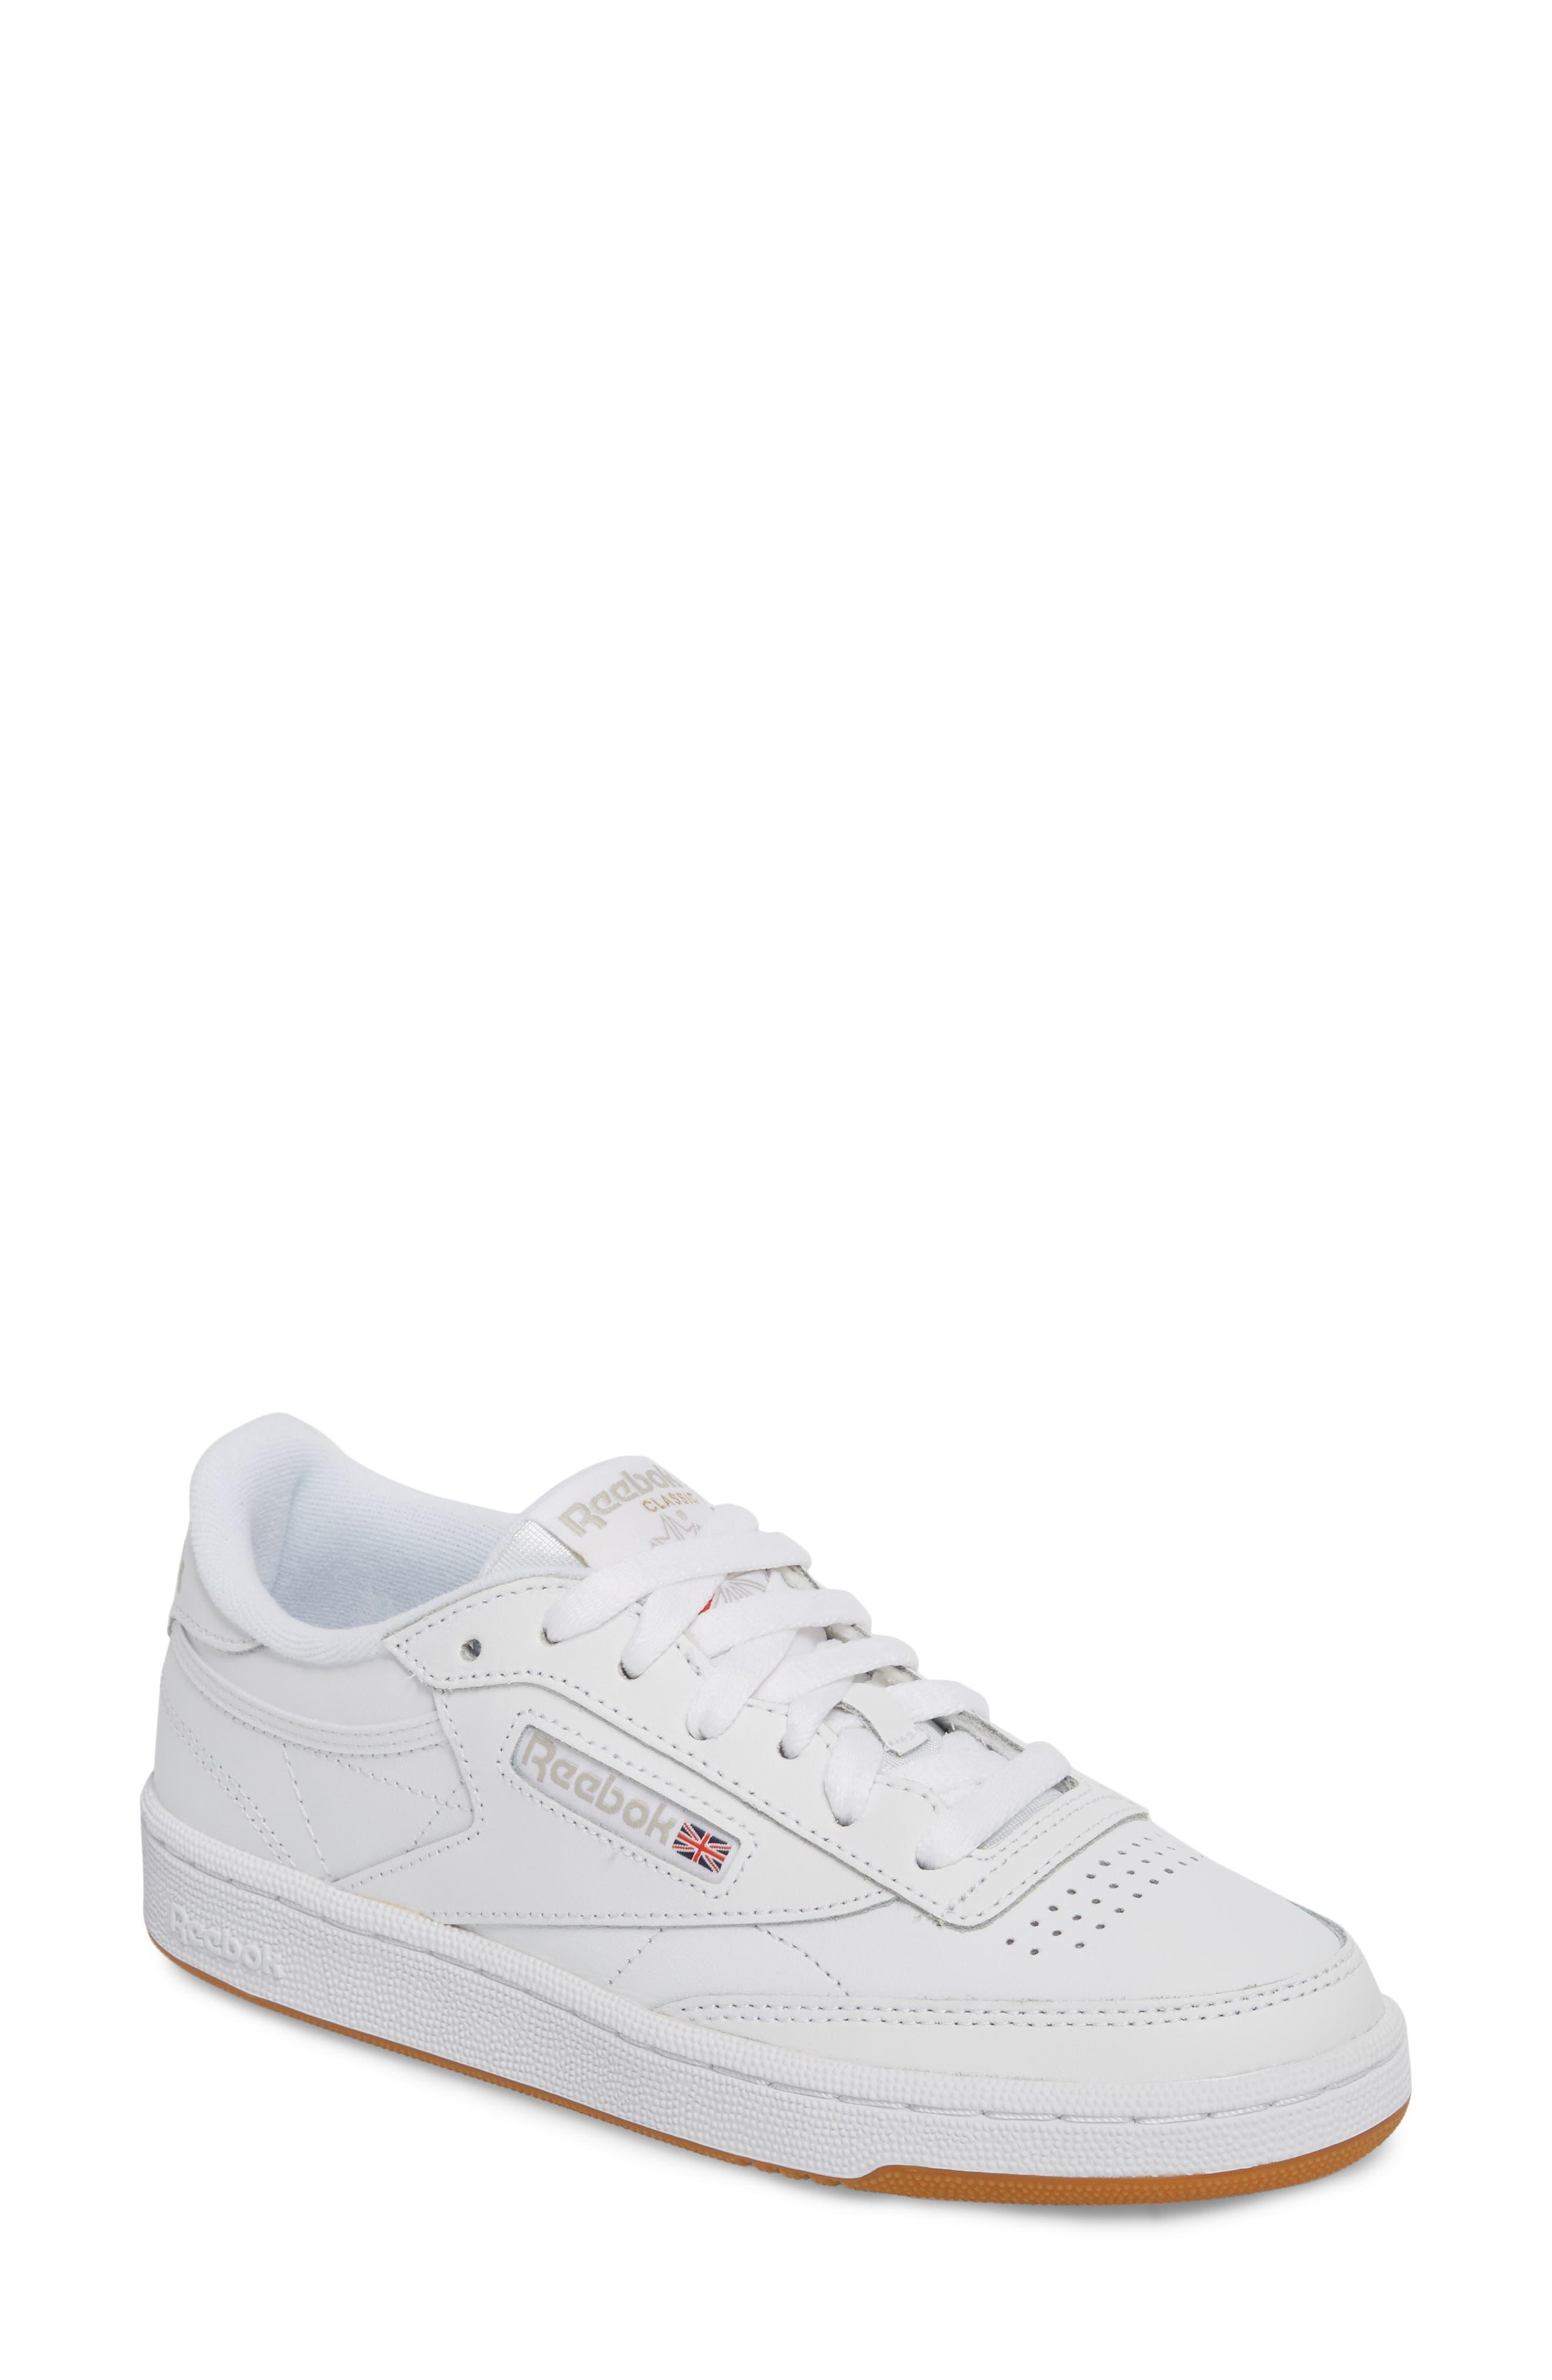 Club C 85 Sneaker,                             Main thumbnail 1, color,                             WHITE/ LIGHT GREY/ GUM